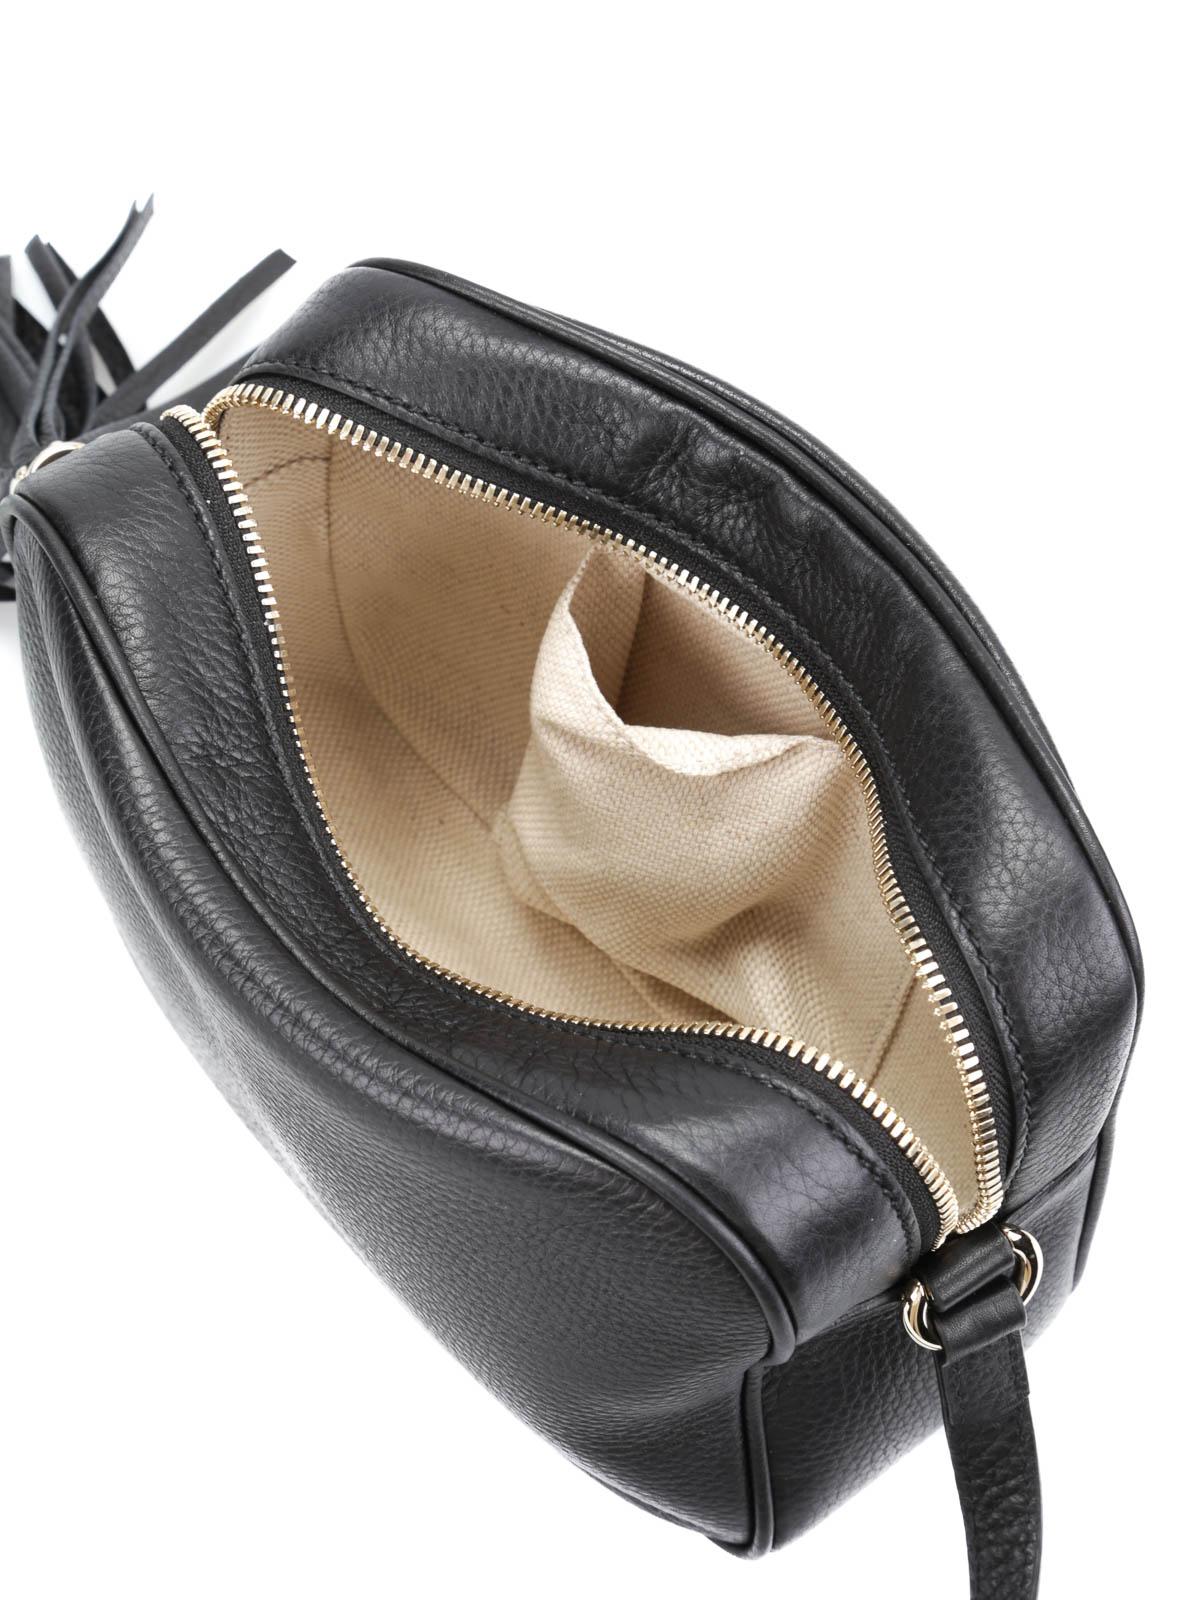 Gucci Soho Leather Disco Bag Cross Body Bags 308364 A7m0g 1000 Ikrix